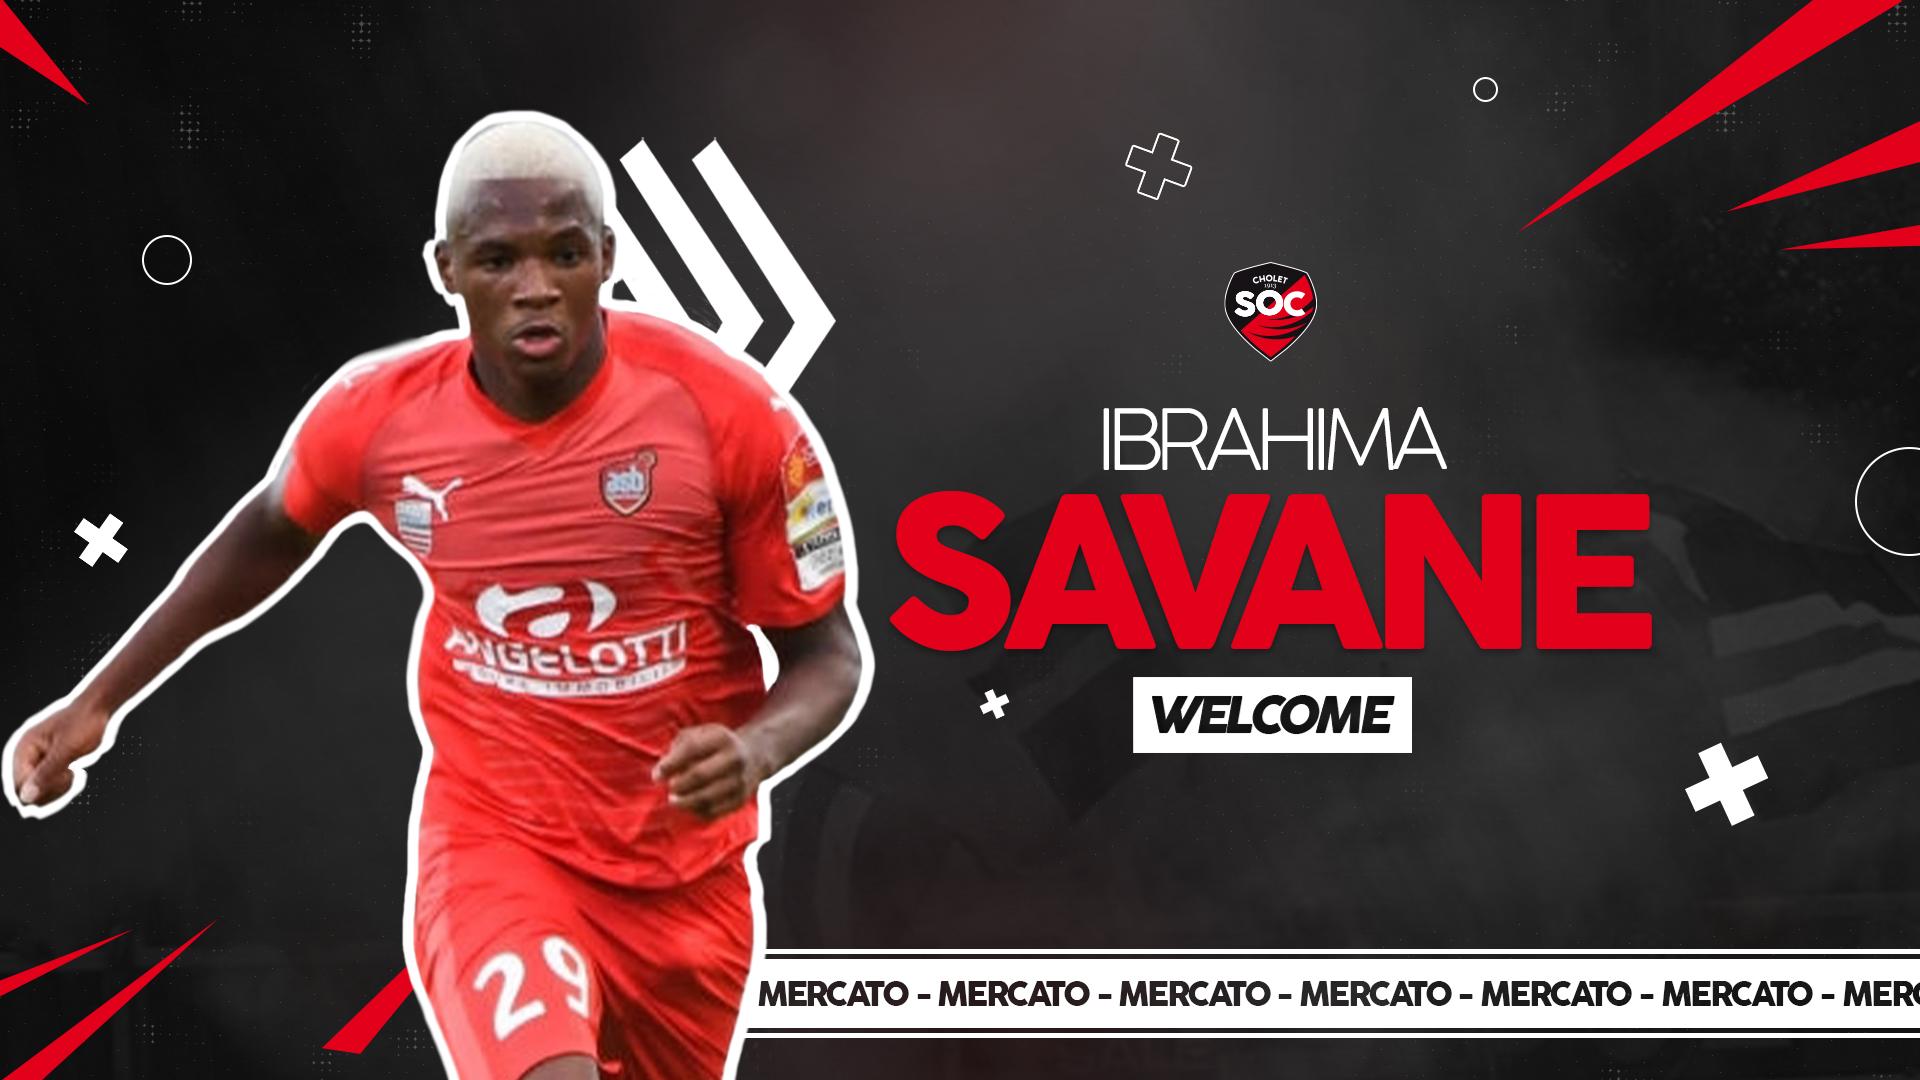 Ibrahima Savane Recrutement